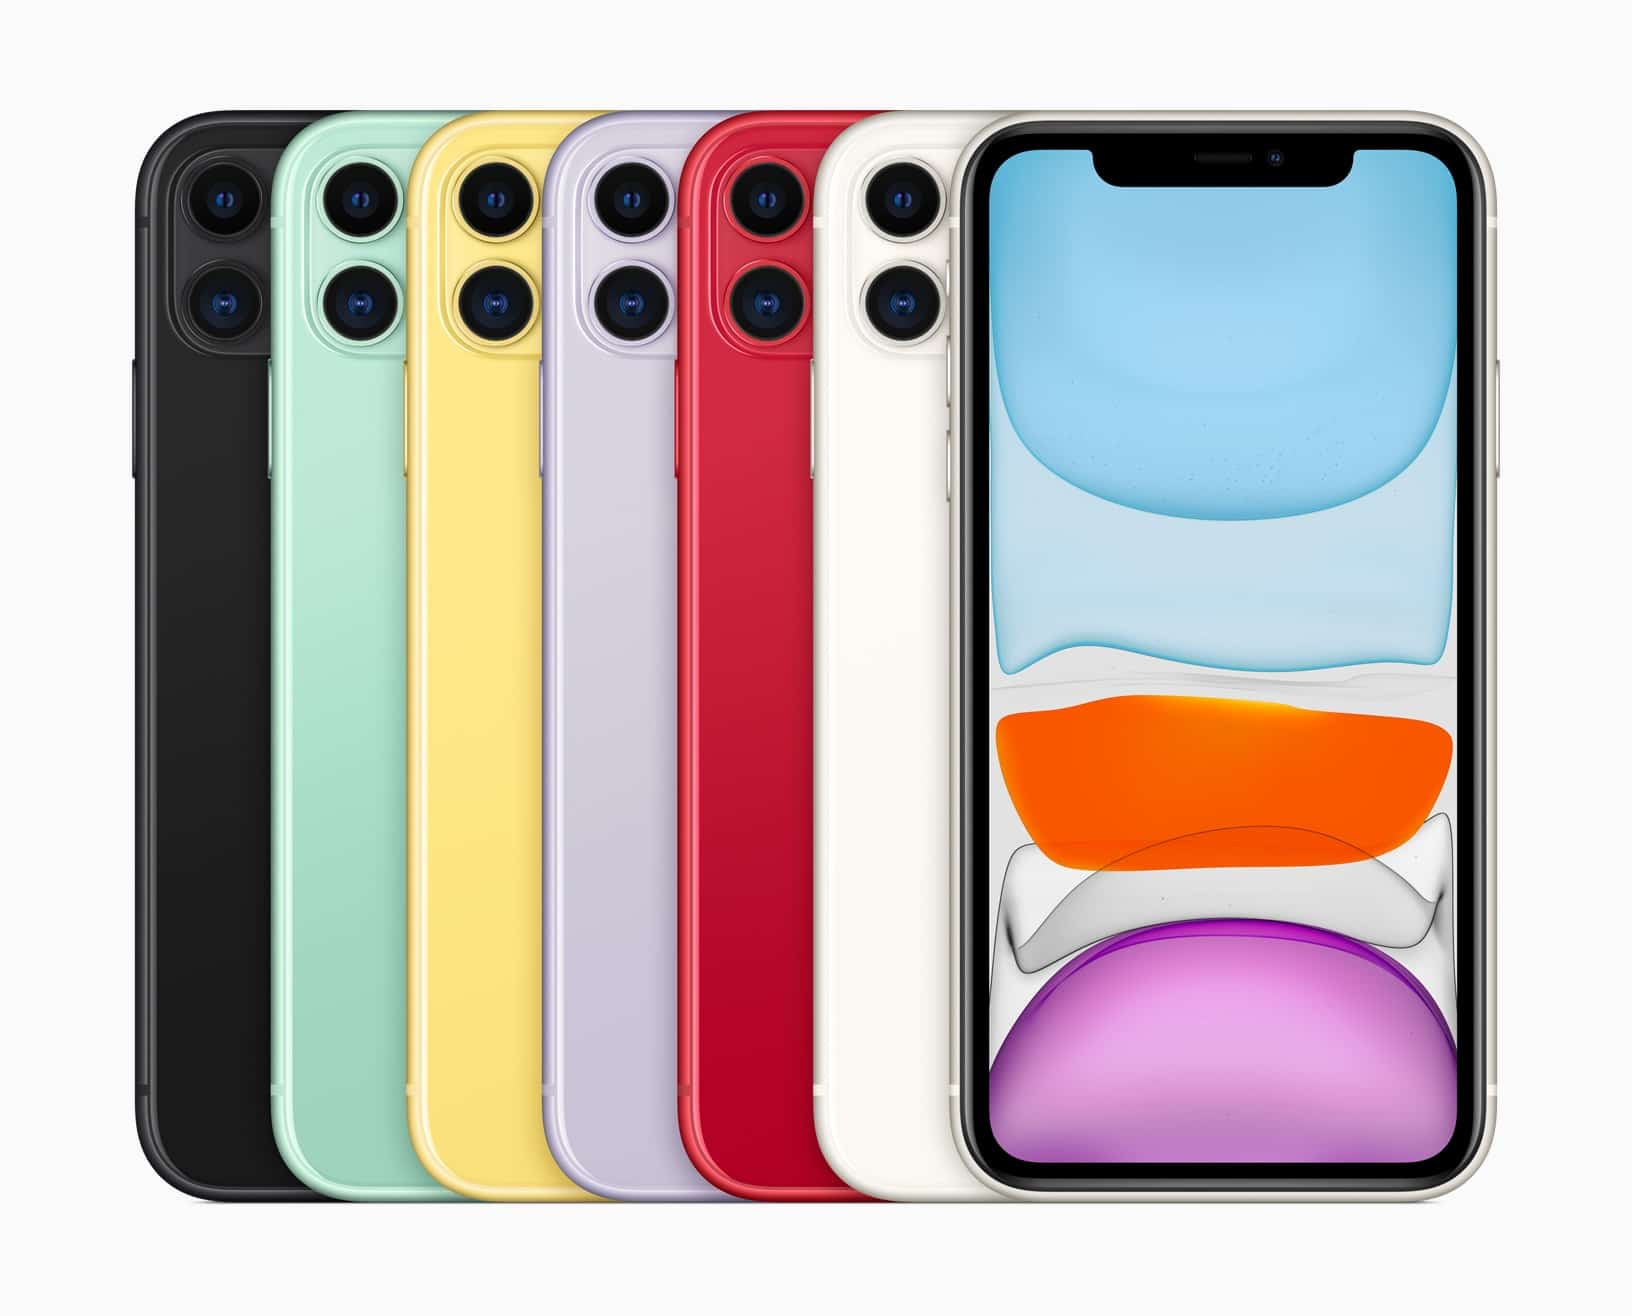 Apple iphone 11 family lineup 091019 - Qual iPhone comprar em 2021?